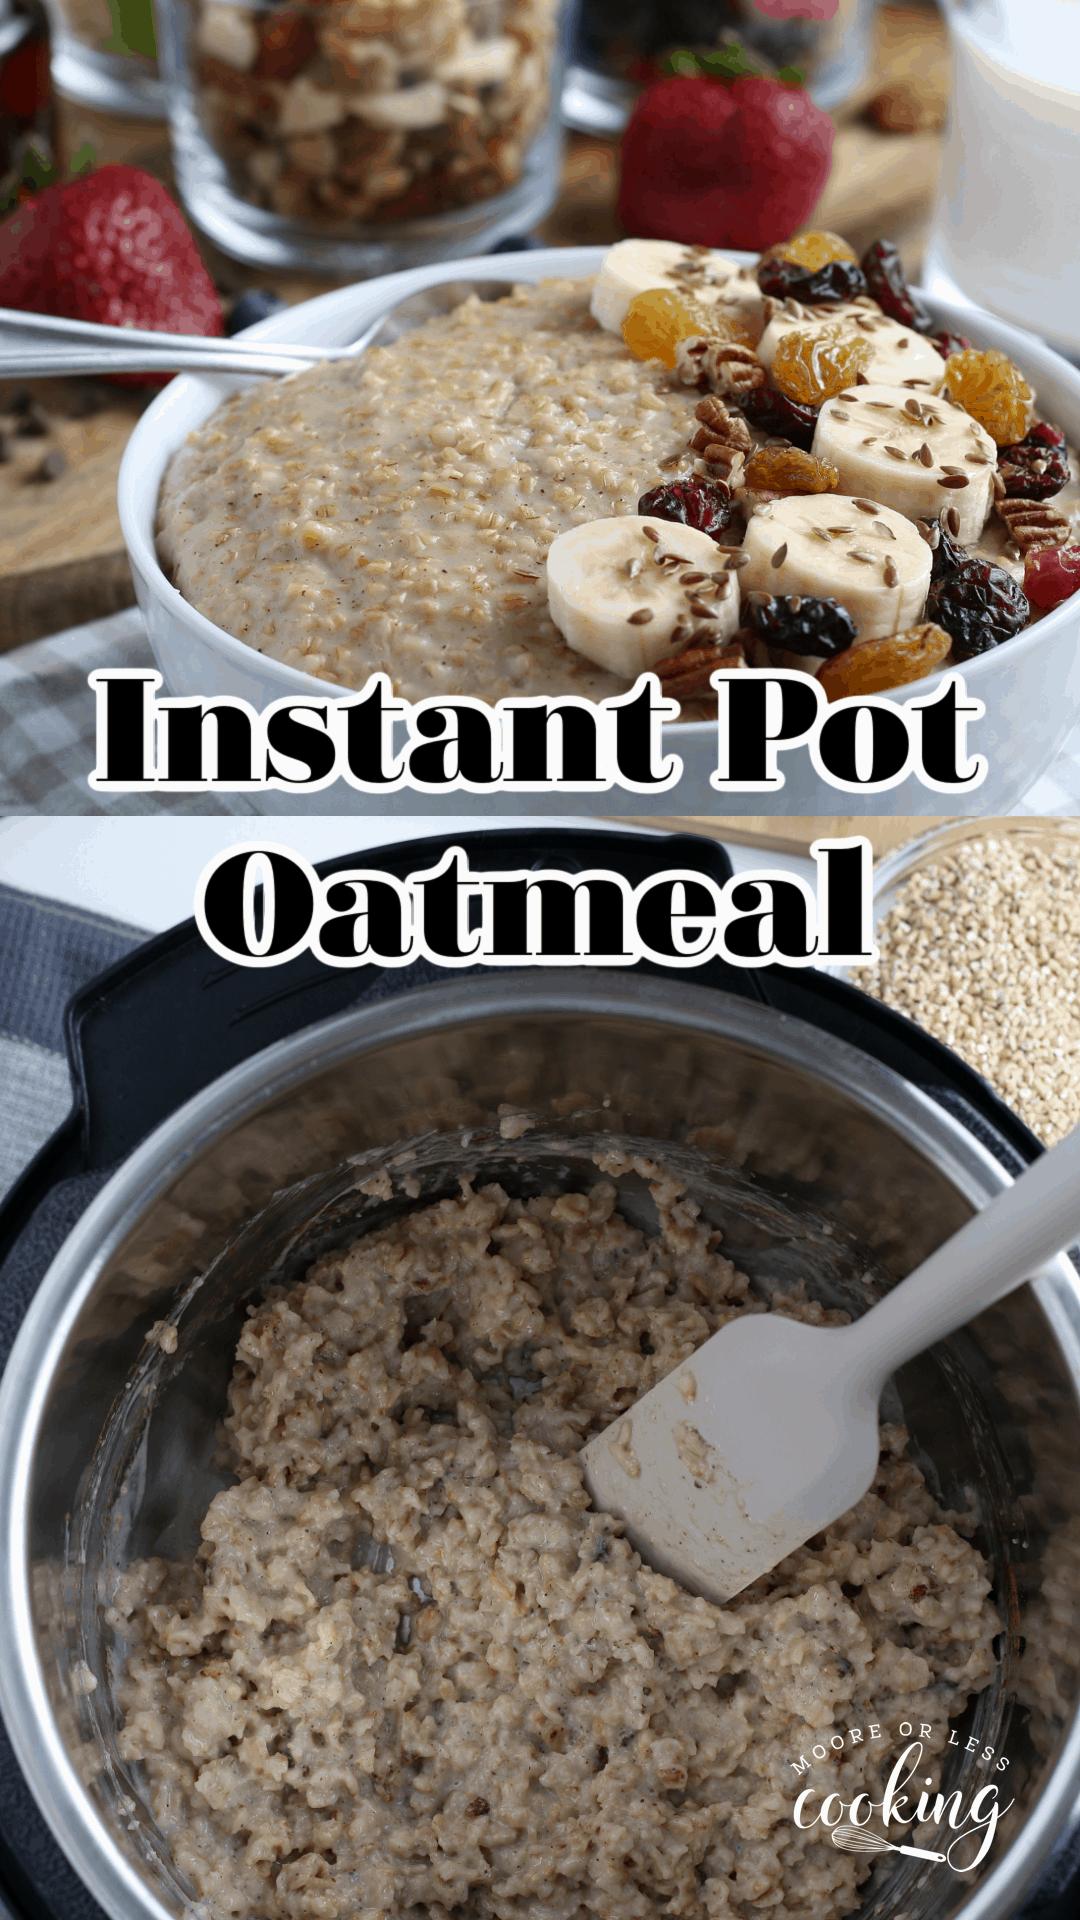 Instant Pot Oatmeal pn